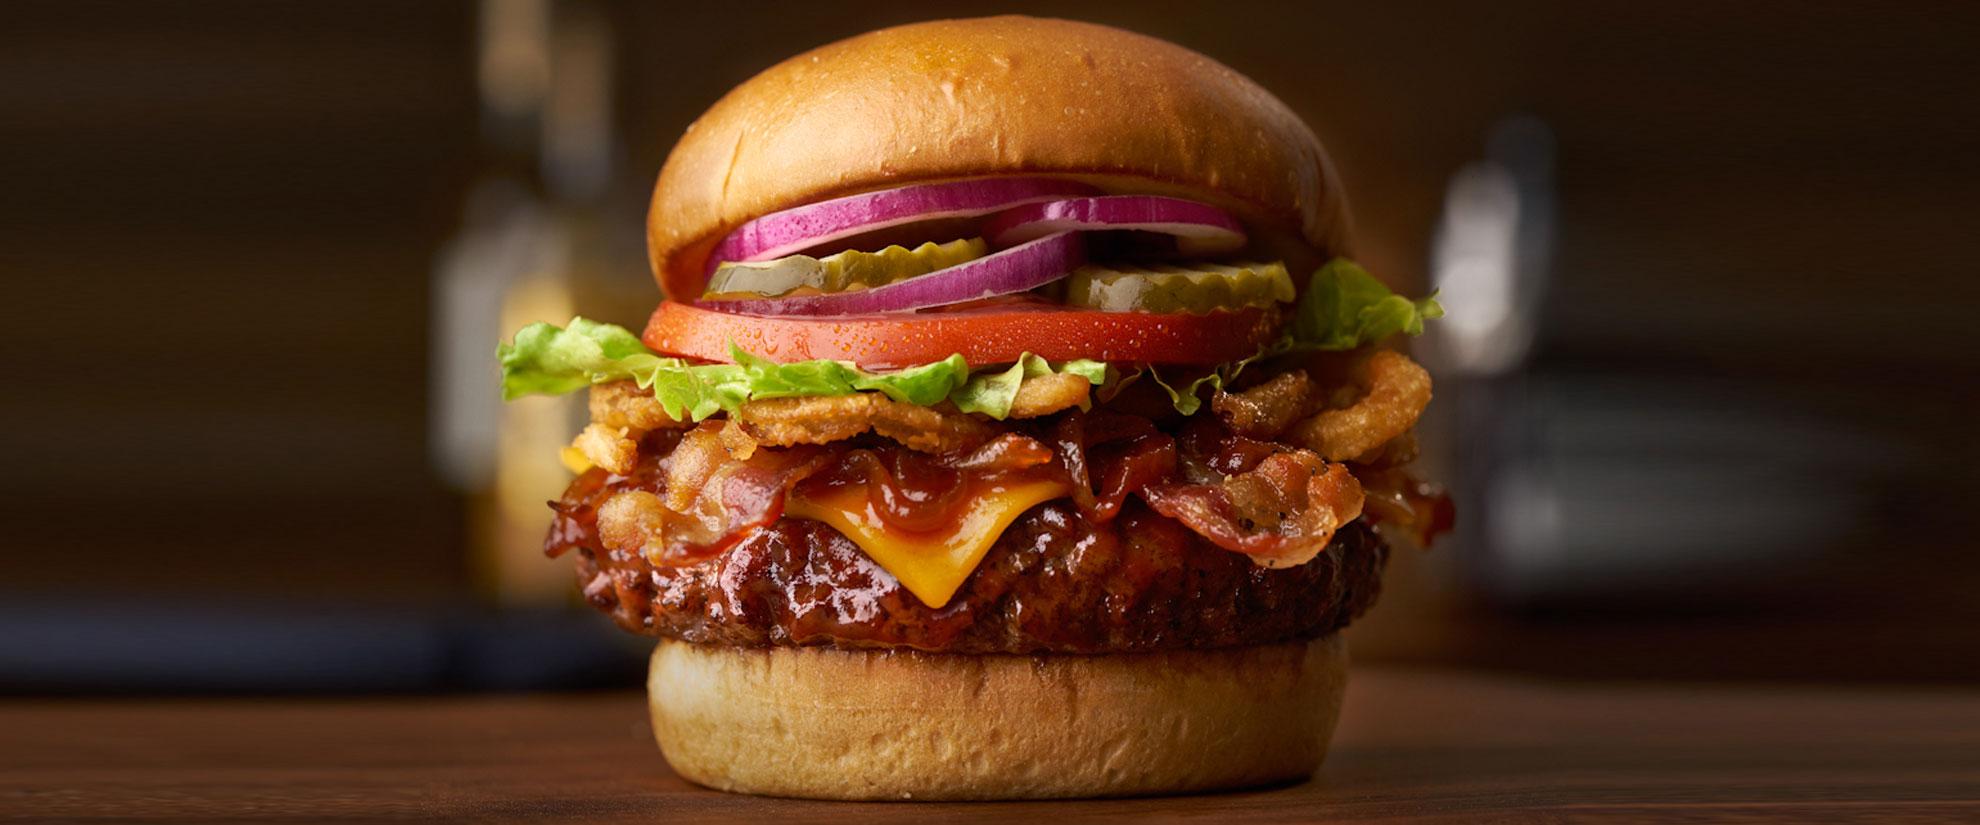 Sticker other manger bon burger